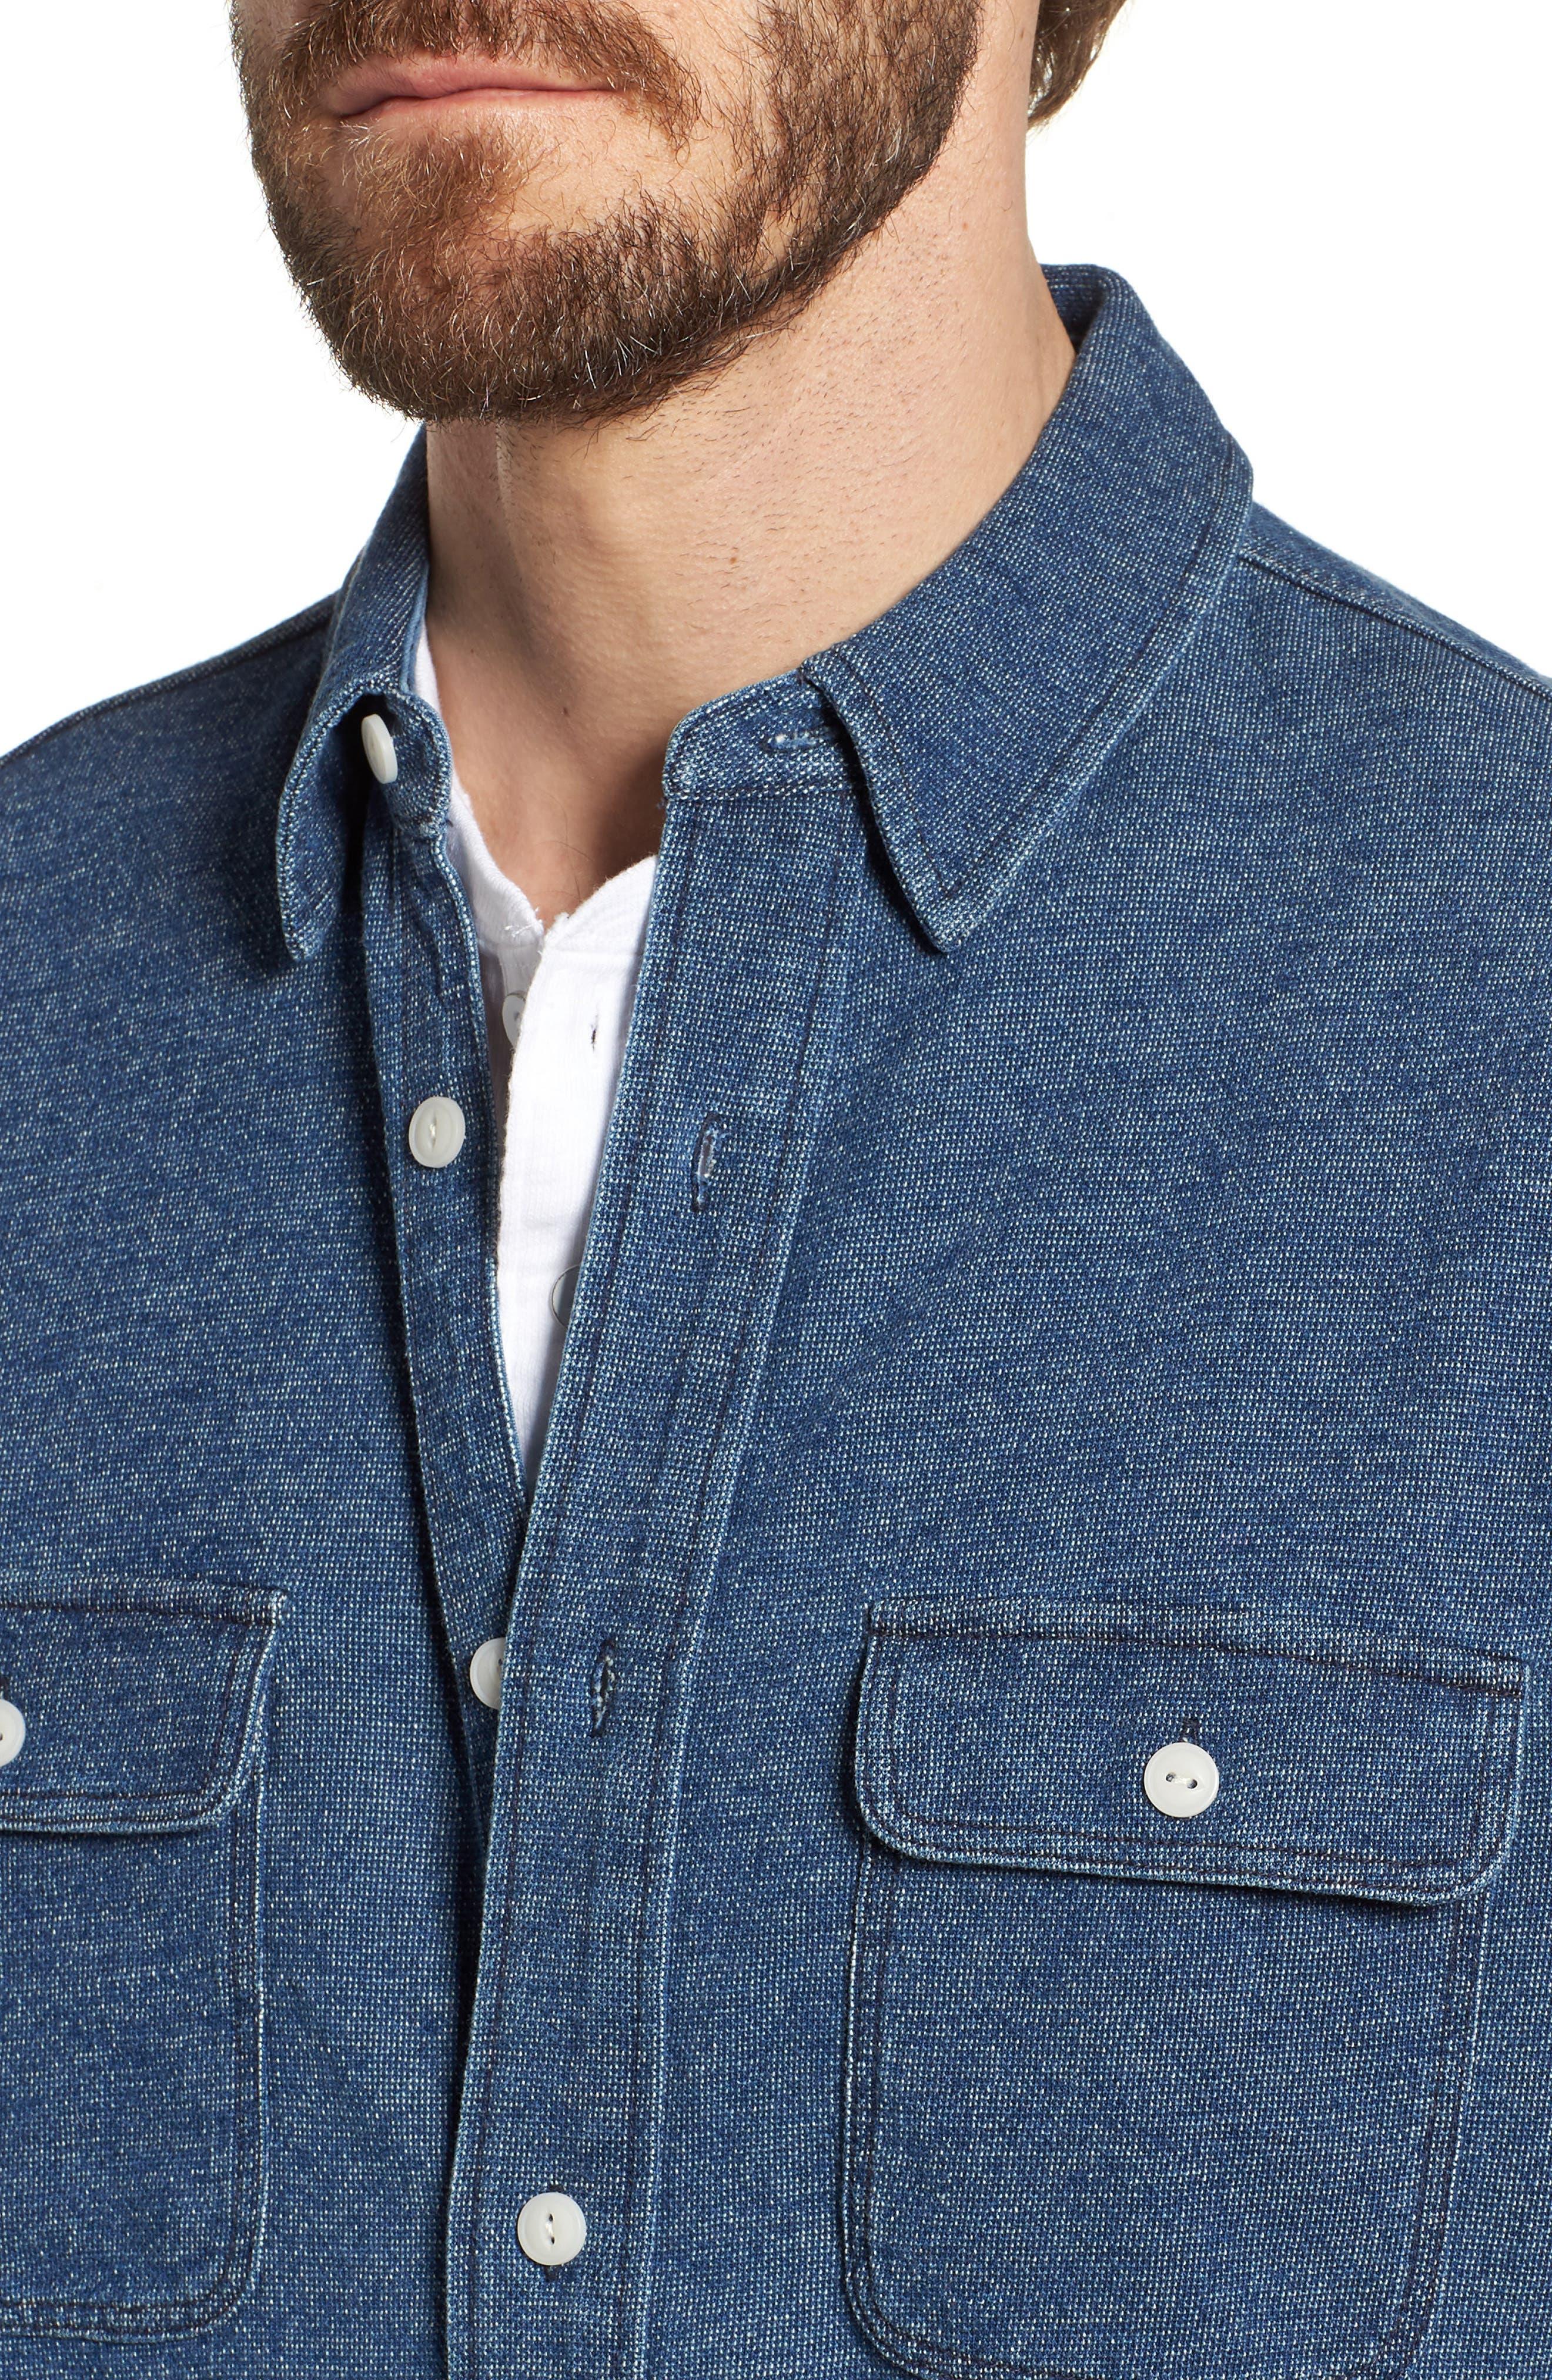 Belmar Chambray Knit Sport Shirt,                             Alternate thumbnail 4, color,